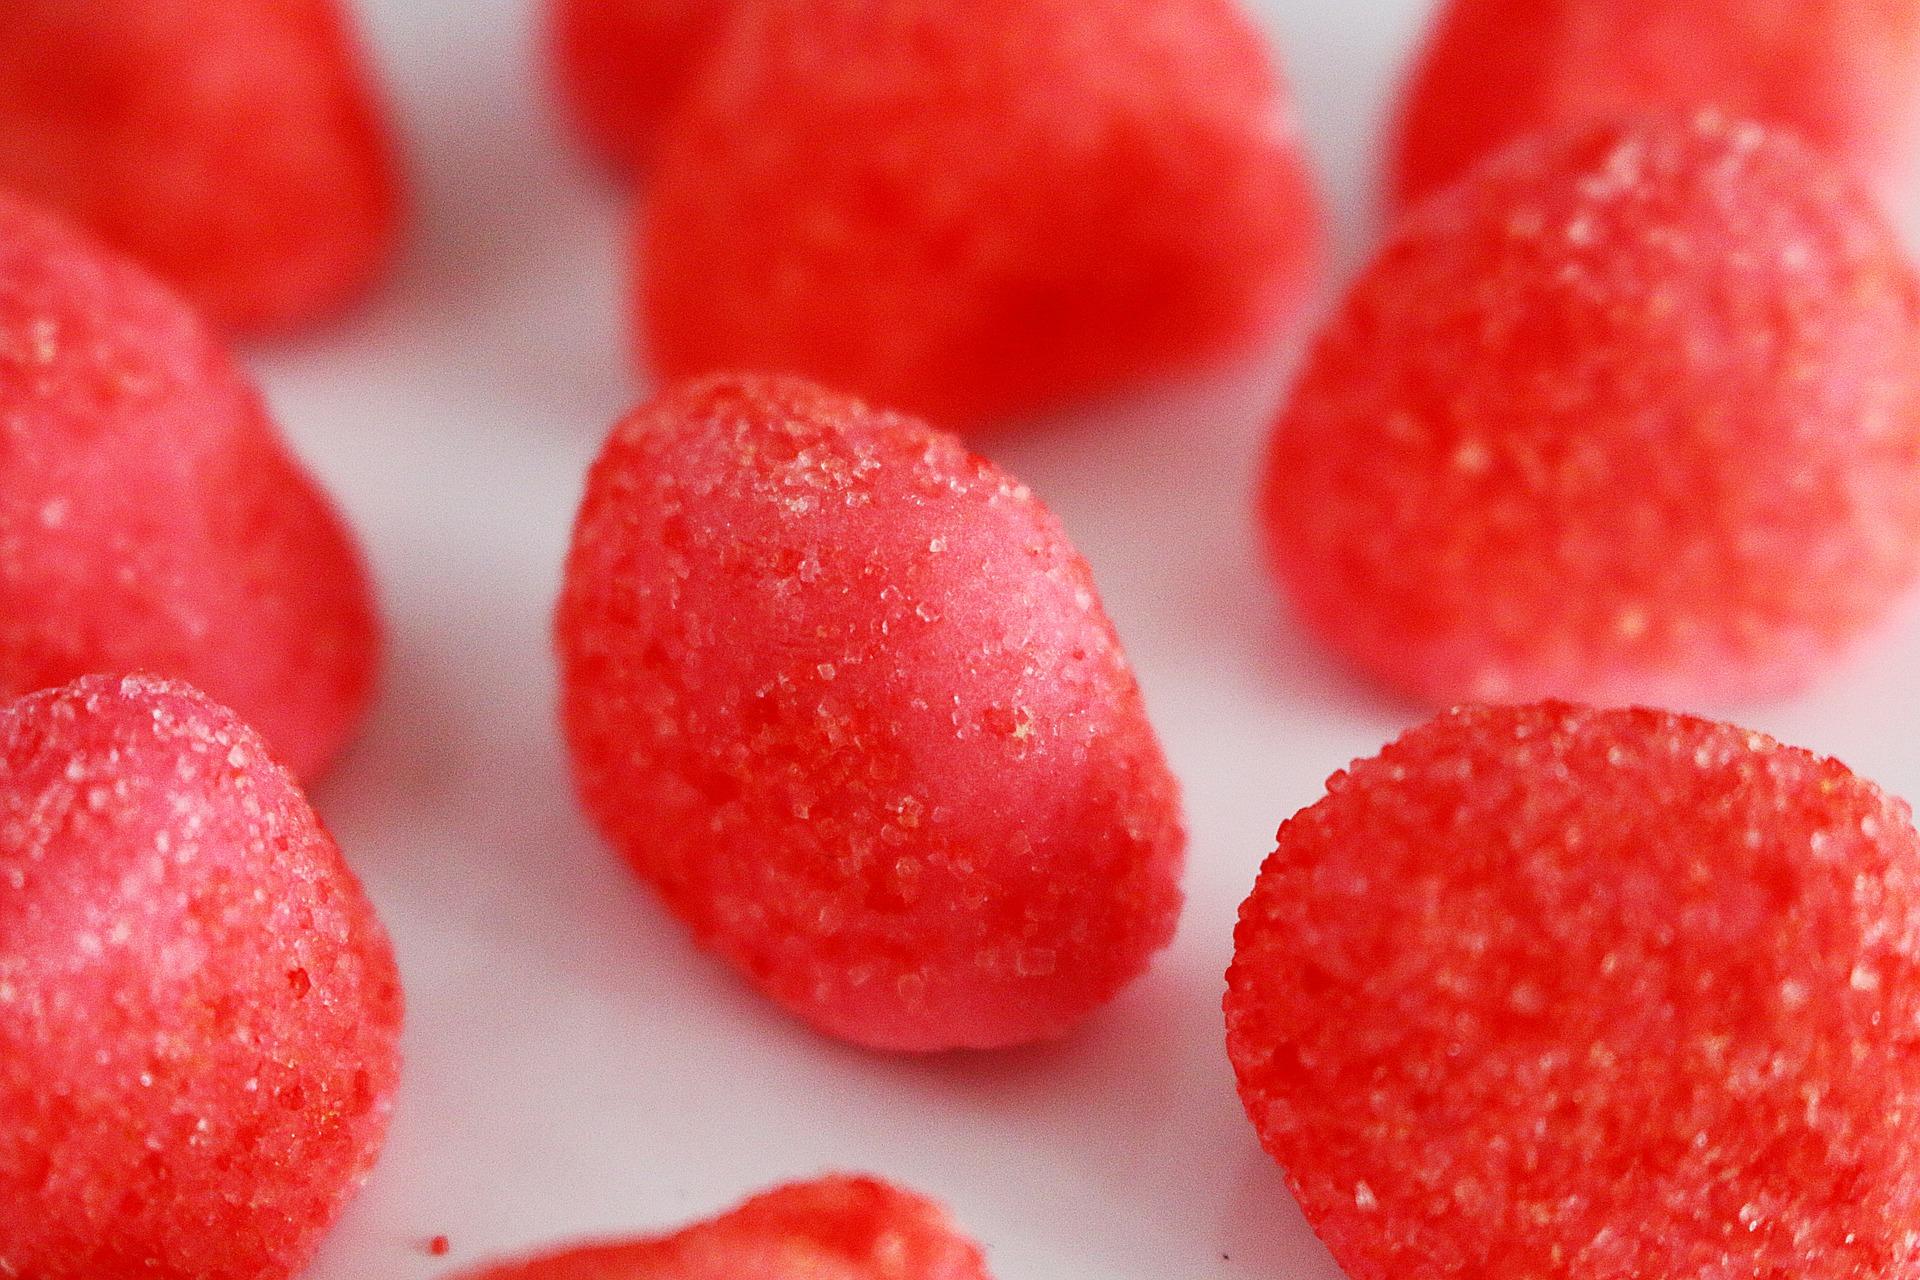 strawberry-357306_1920